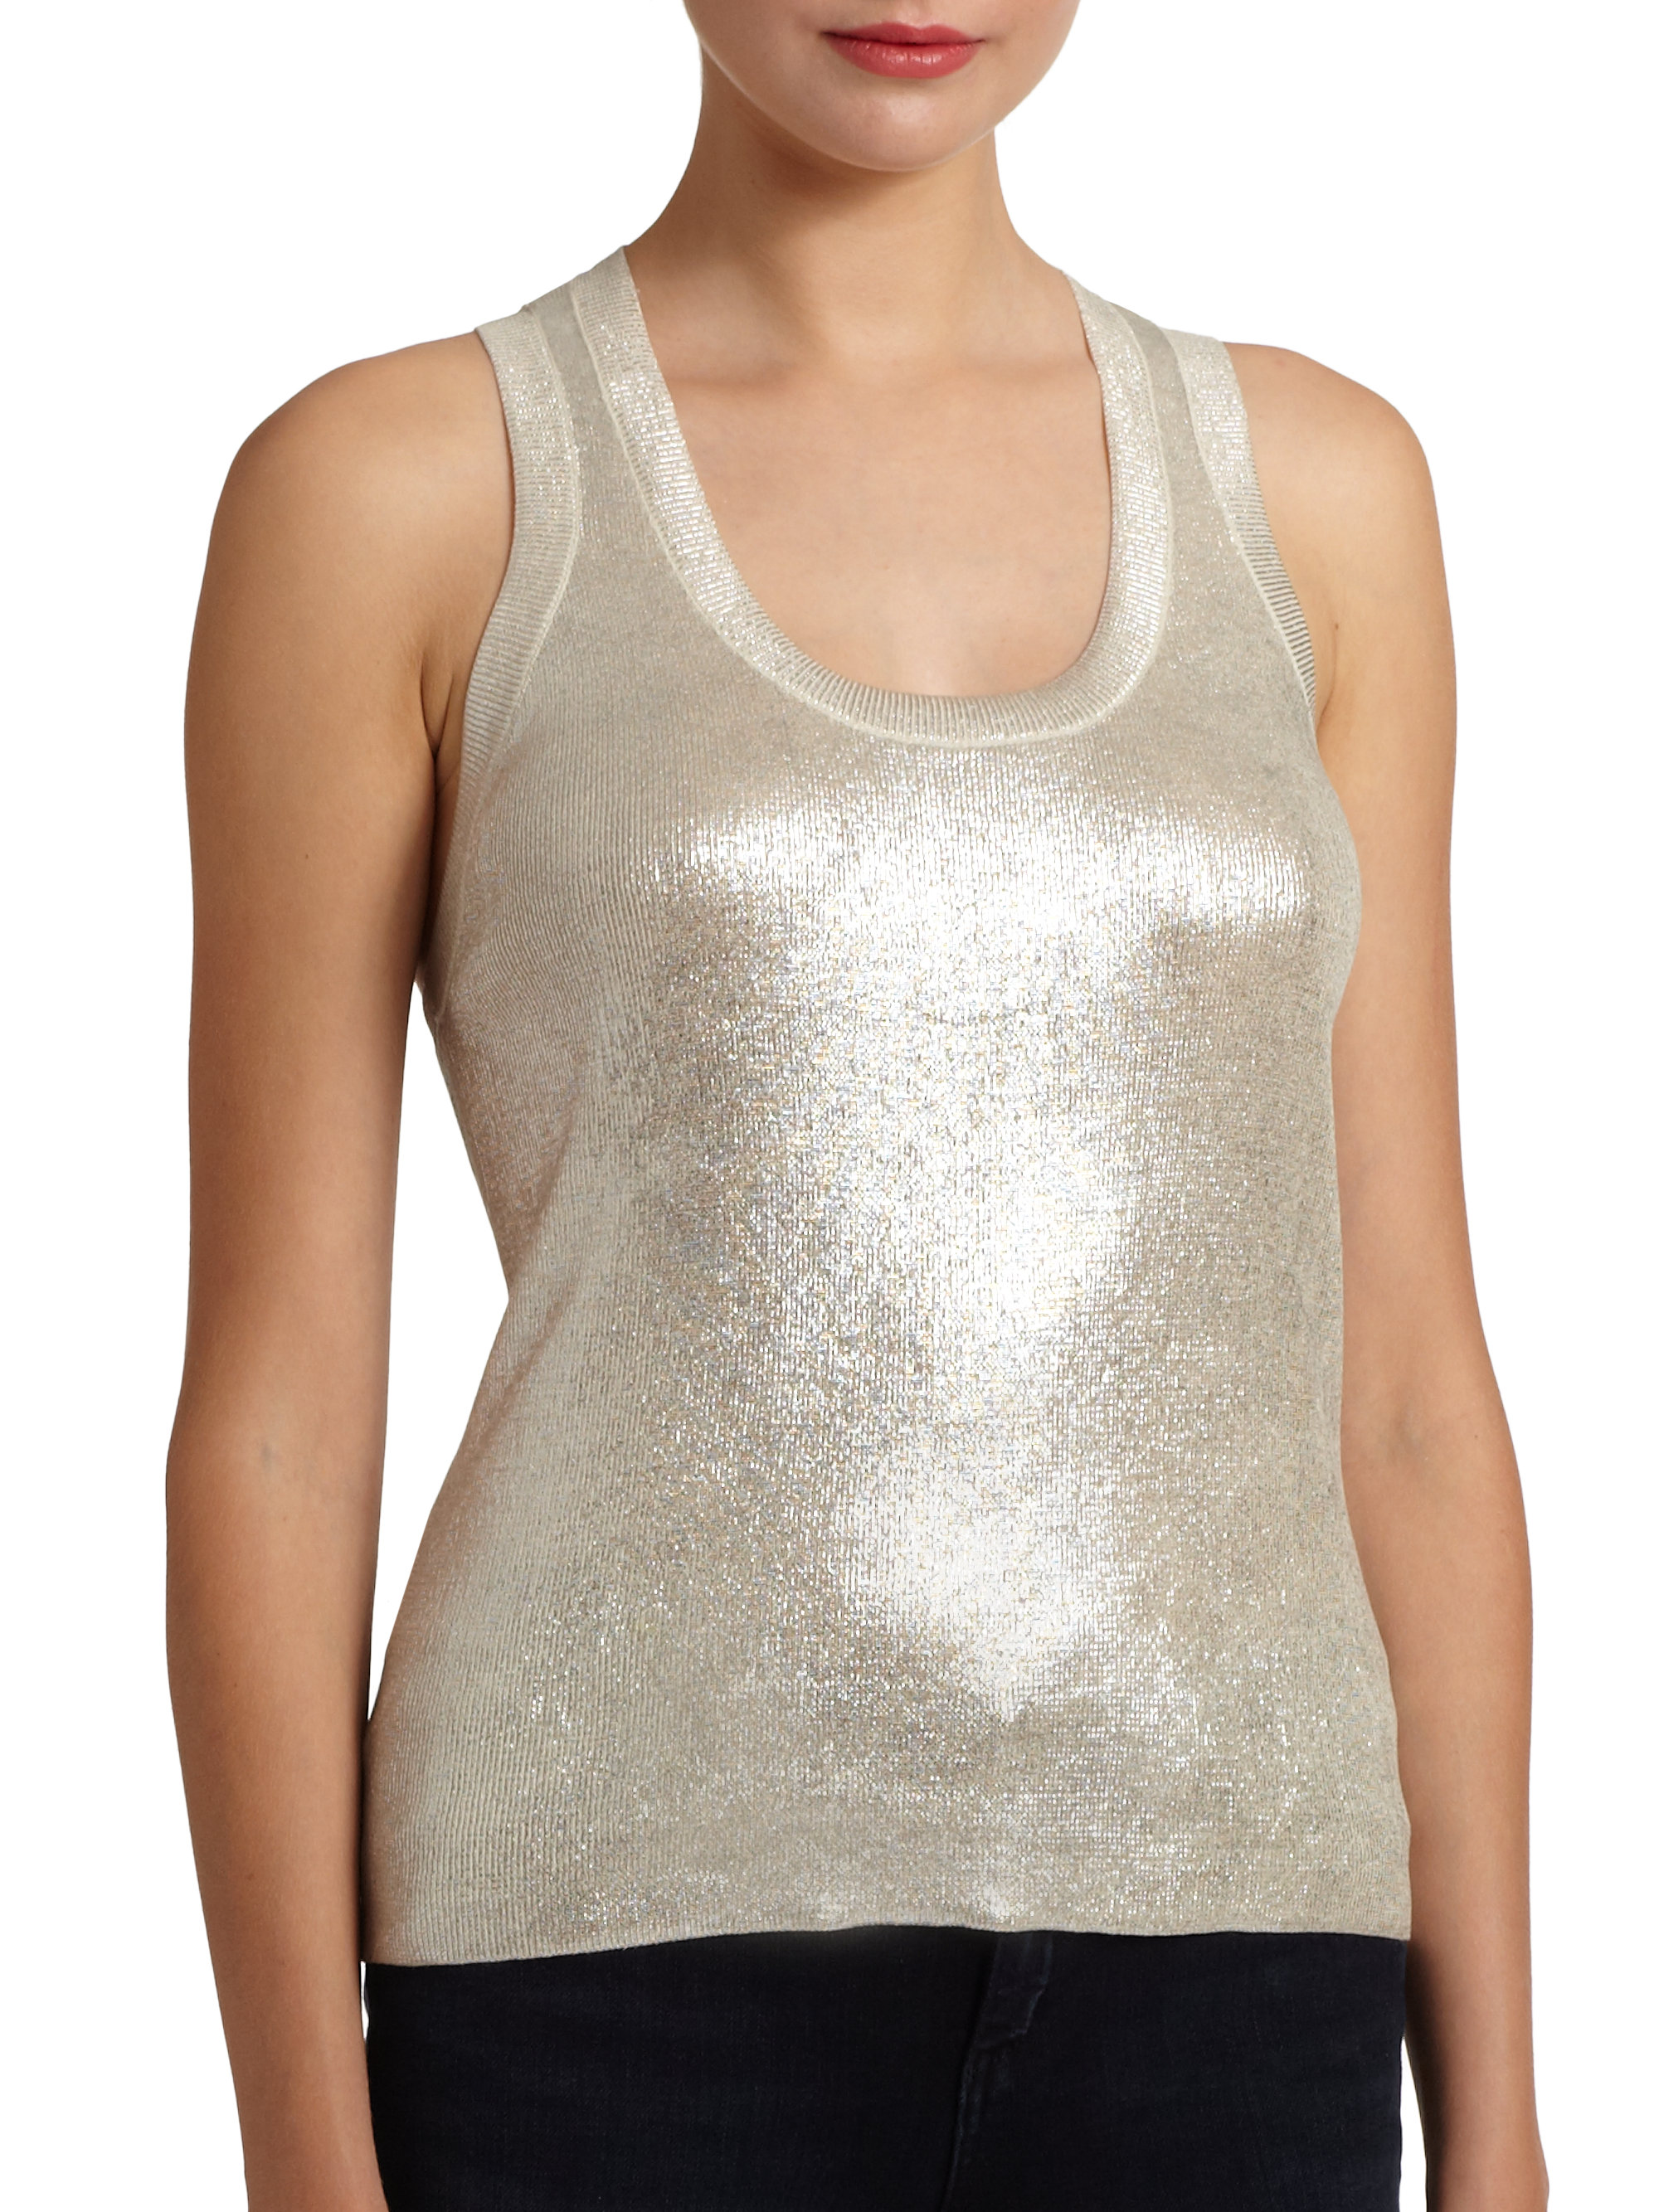 Tank Top Fashion Model New Tip Tumblr Girl Tumblr: Robert Rodriguez Metallic Cotton Tank Top In Silver